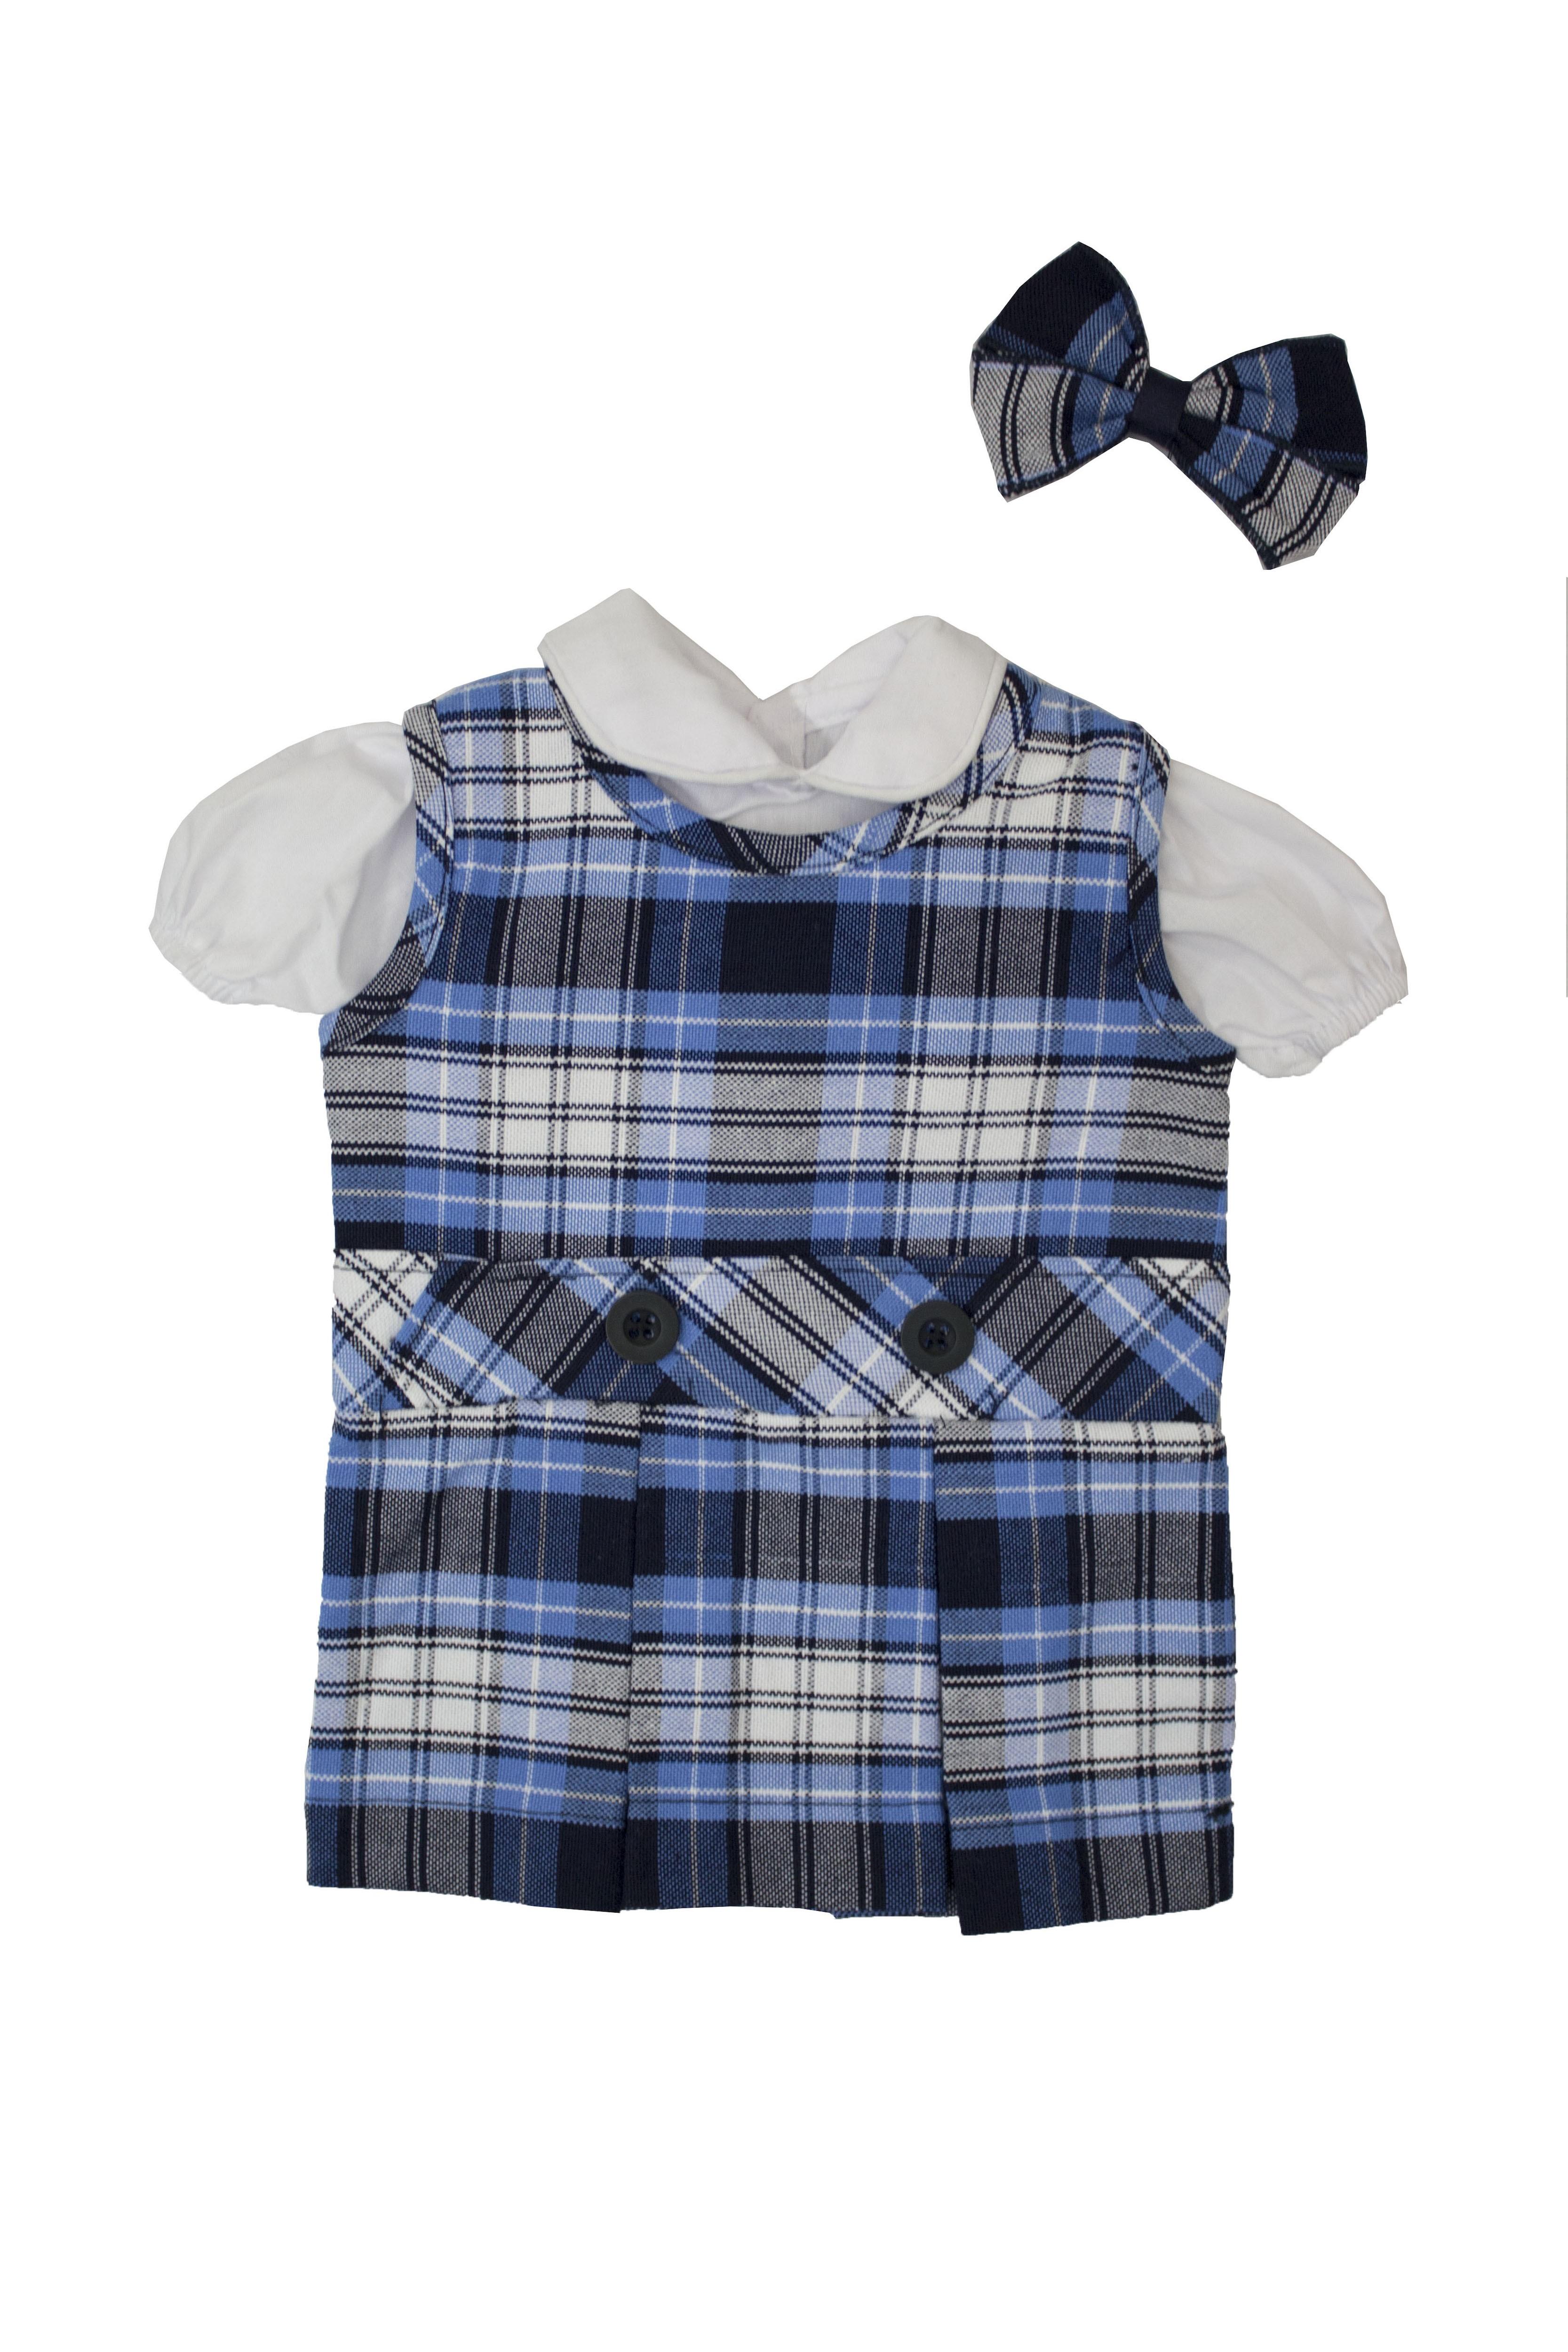 HFS Doll Dress